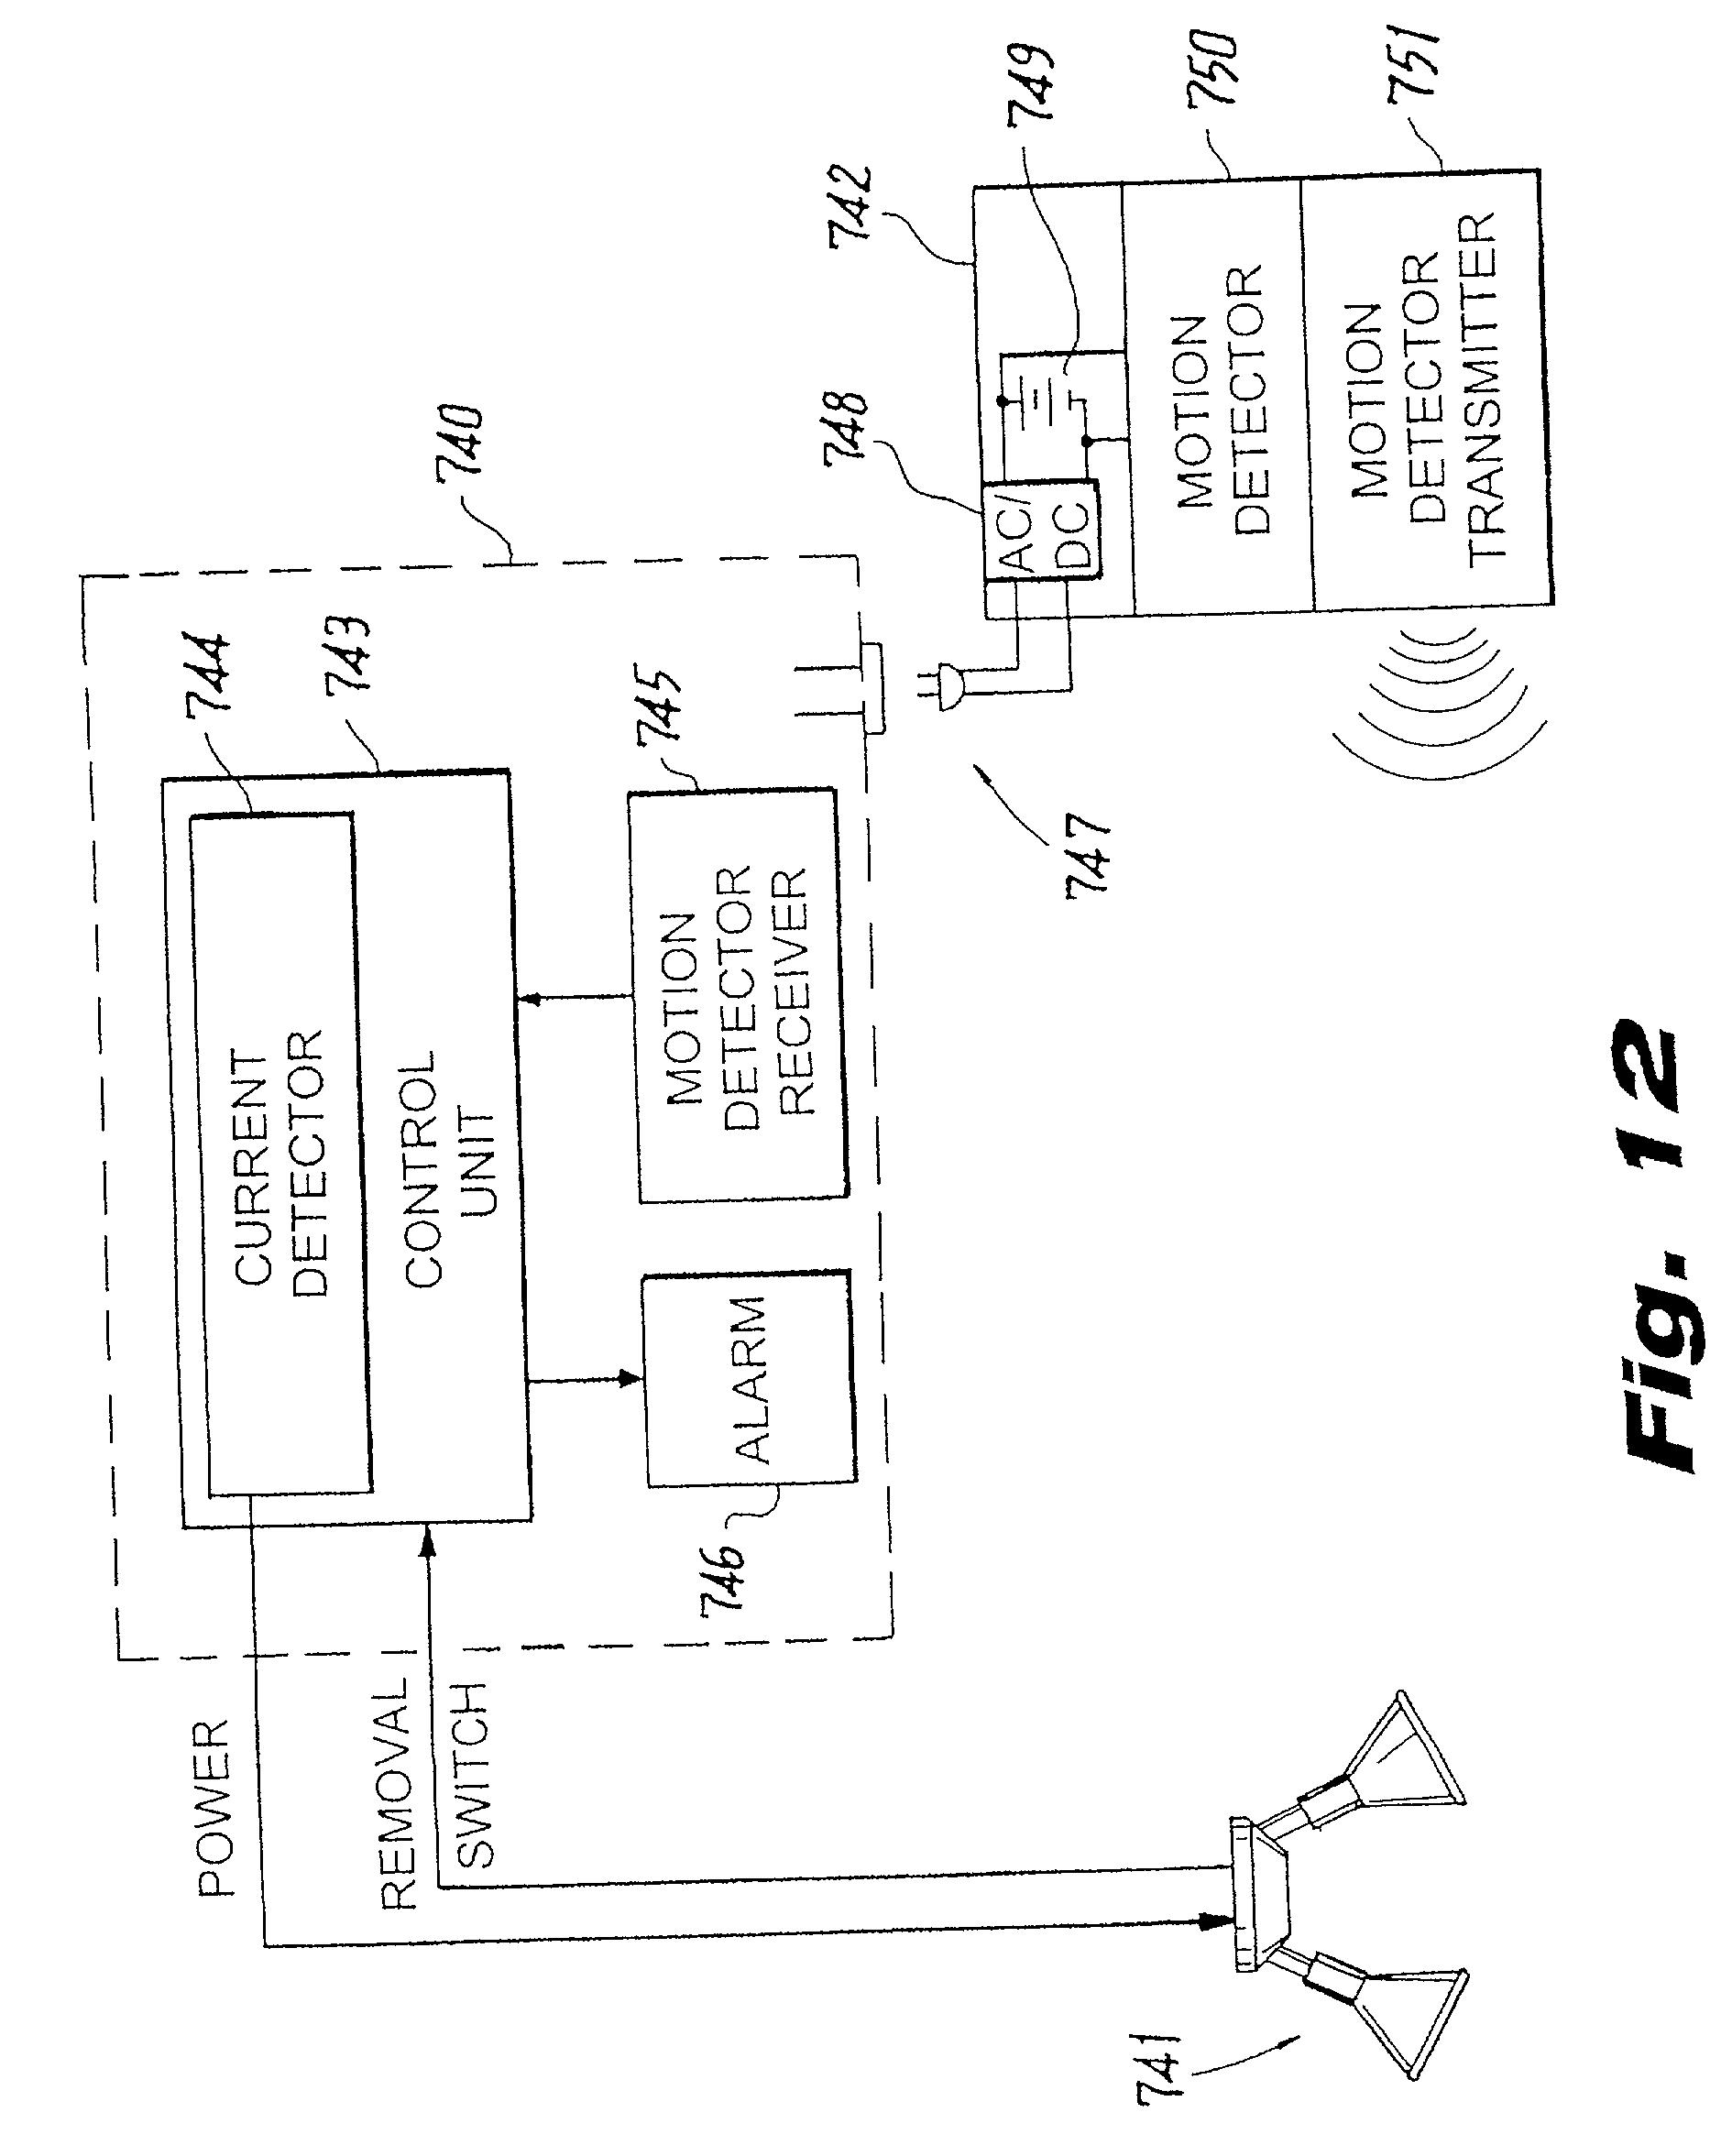 Pumptrol pressure switch wiring diagram images wiring diagram